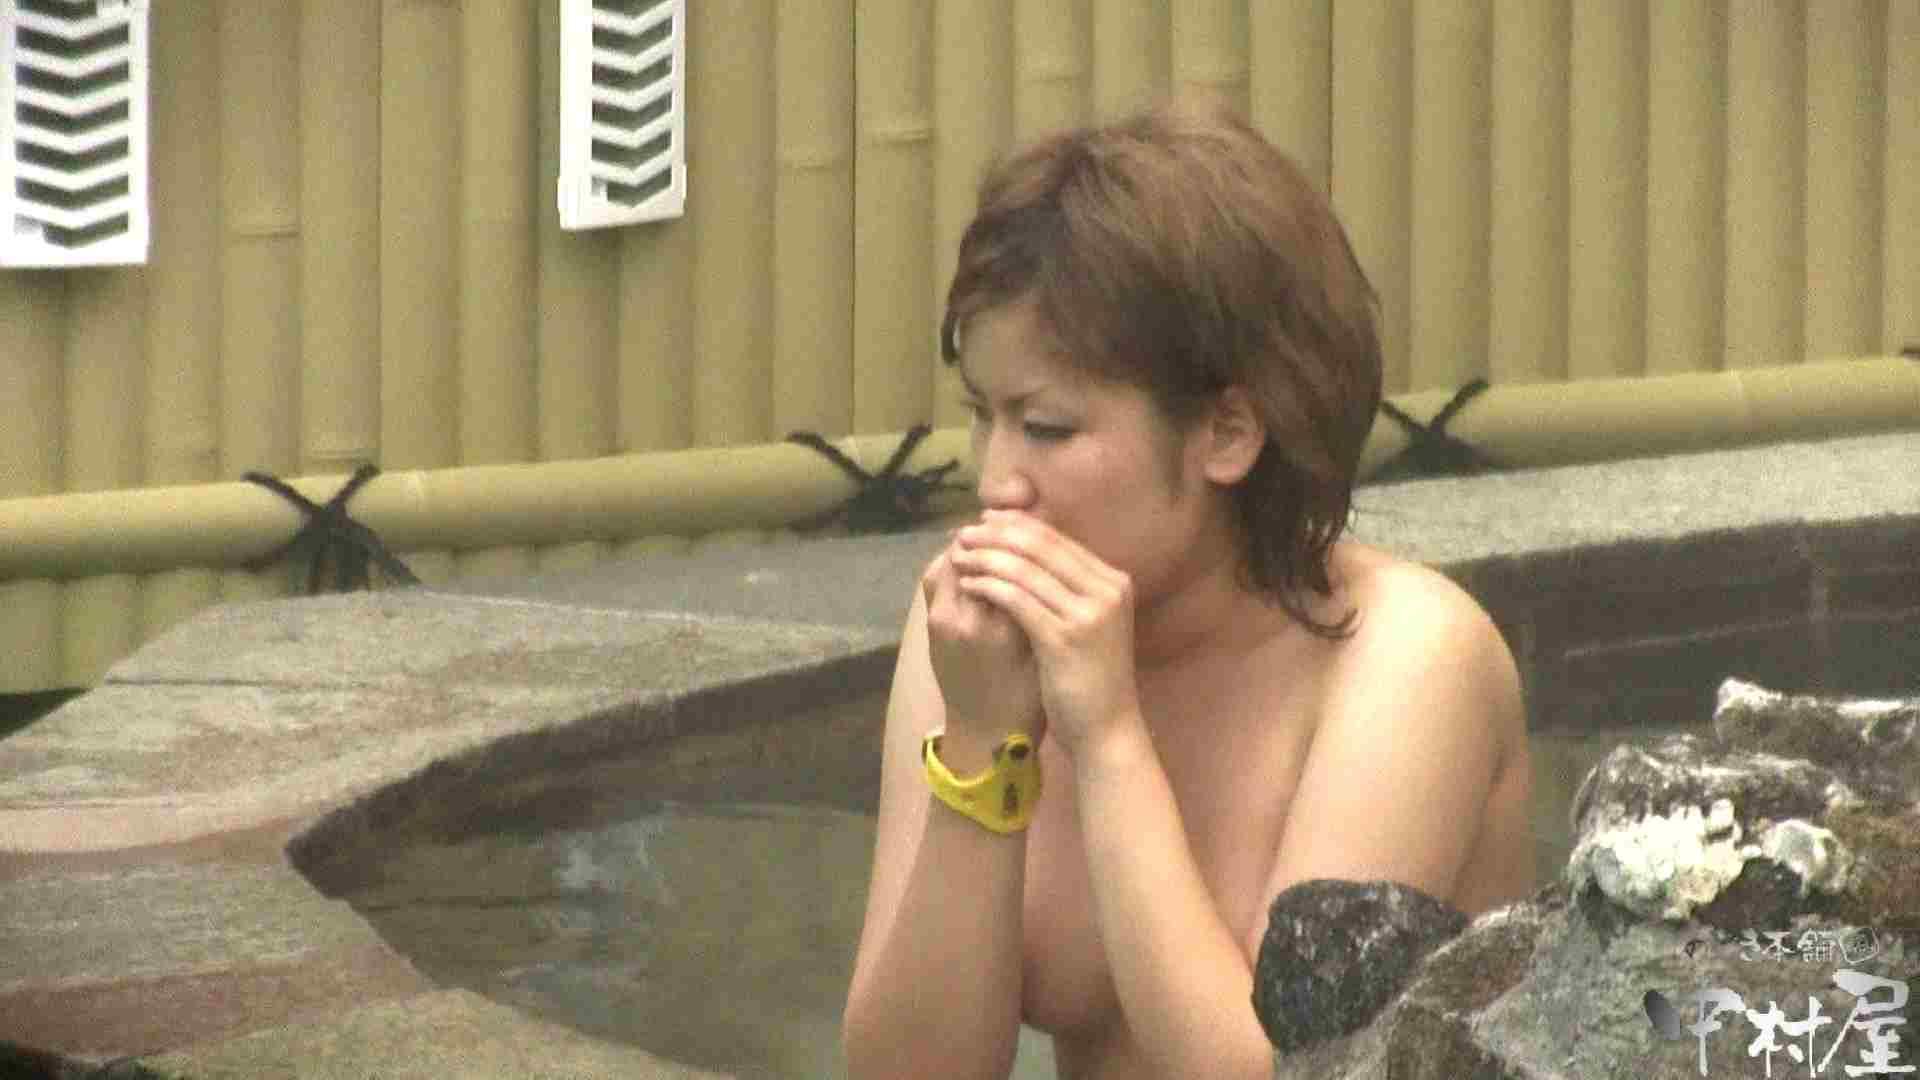 Aquaな露天風呂Vol.918 露天風呂突入 おまんこ無修正動画無料 75pic 32